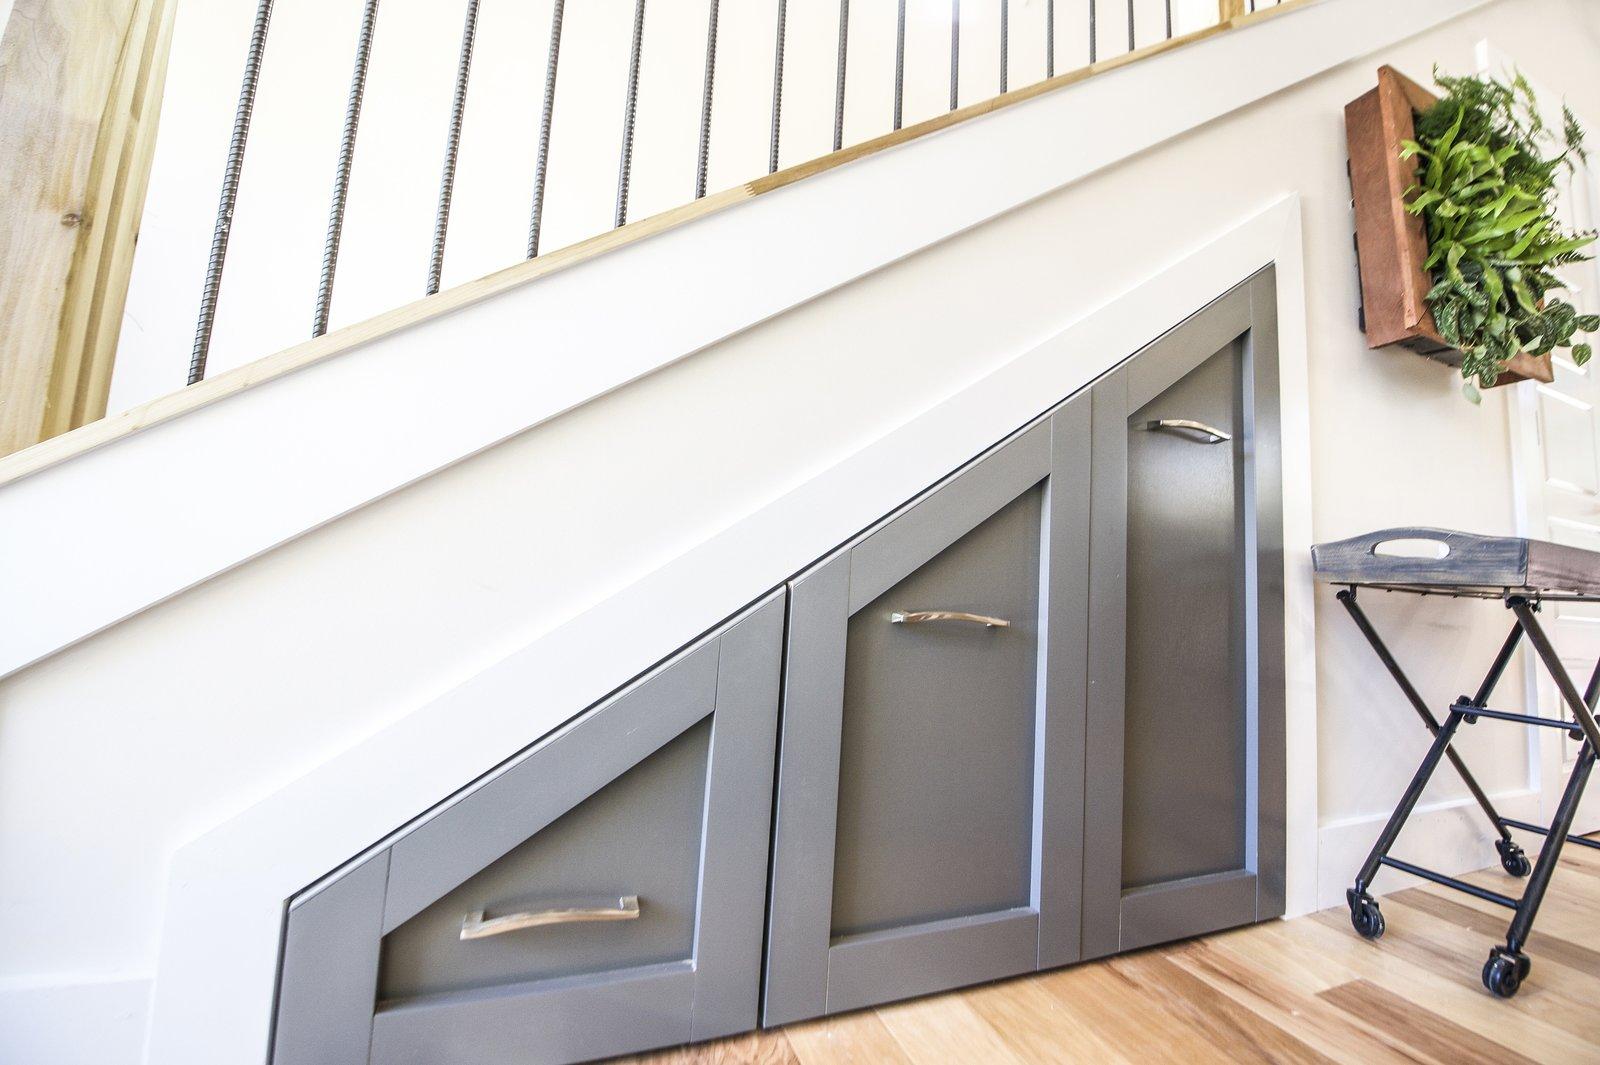 Urban Micro Home staircase storage